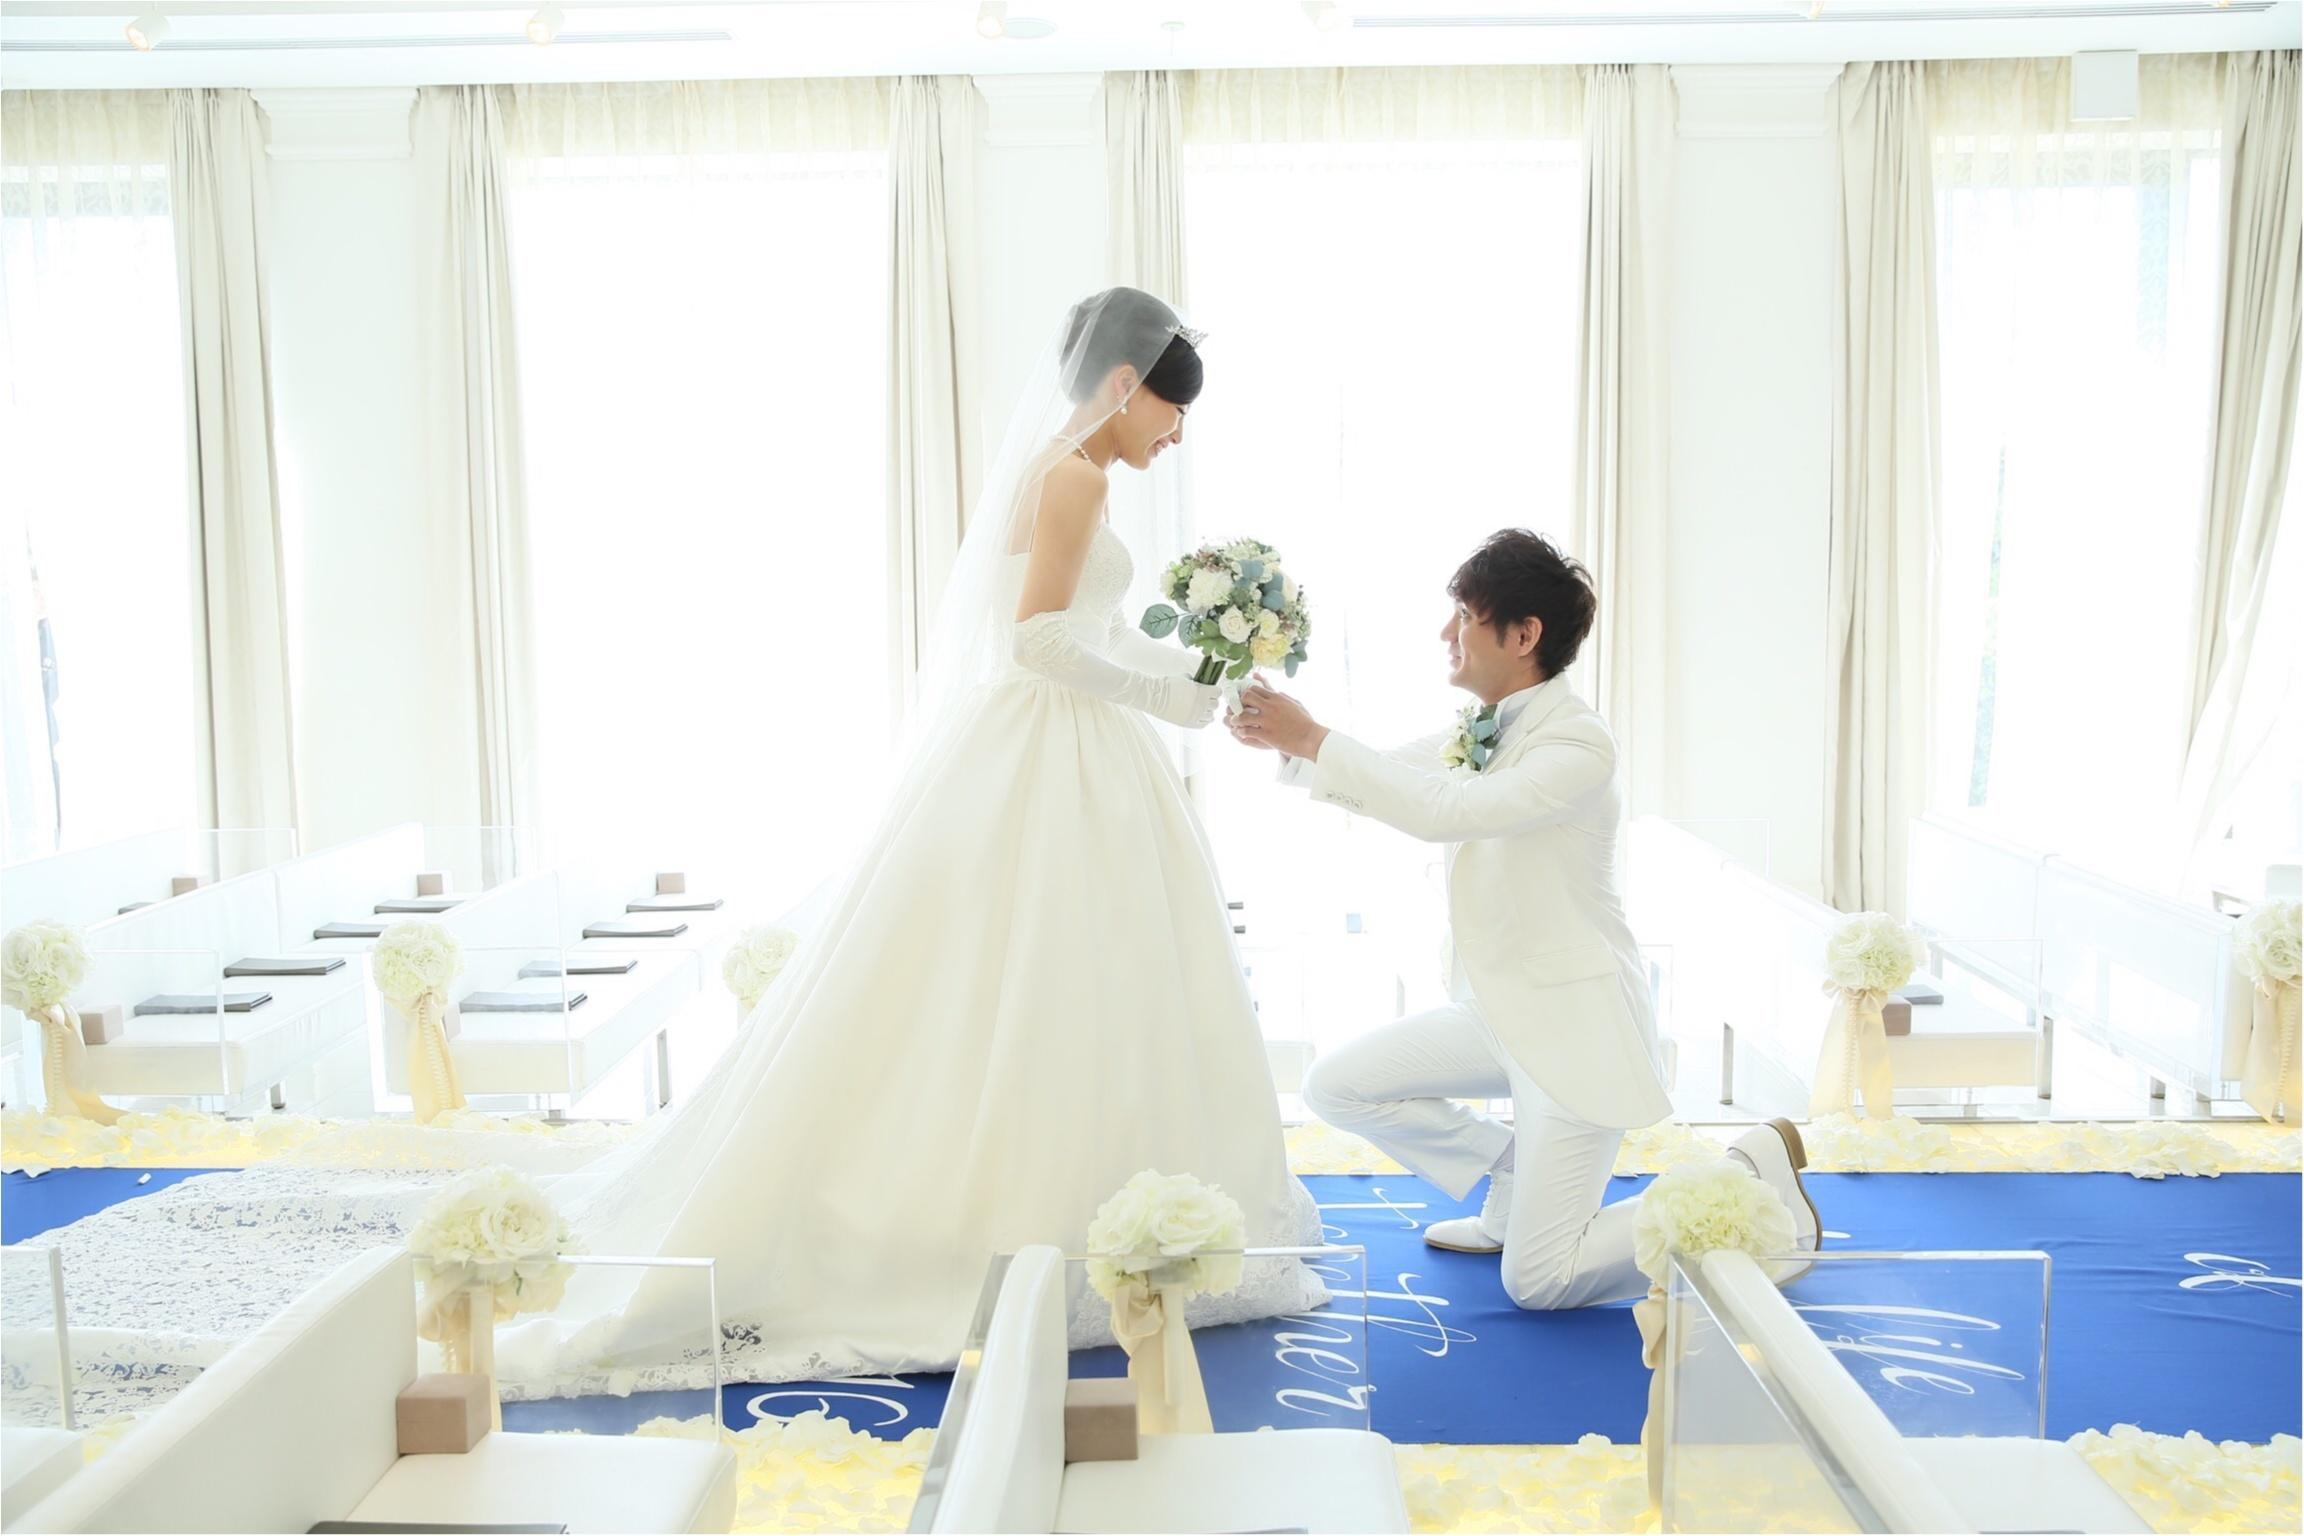 moco婚②▶︎まずは、ドキドキのファーストミート♡♡そこでなんと……_3